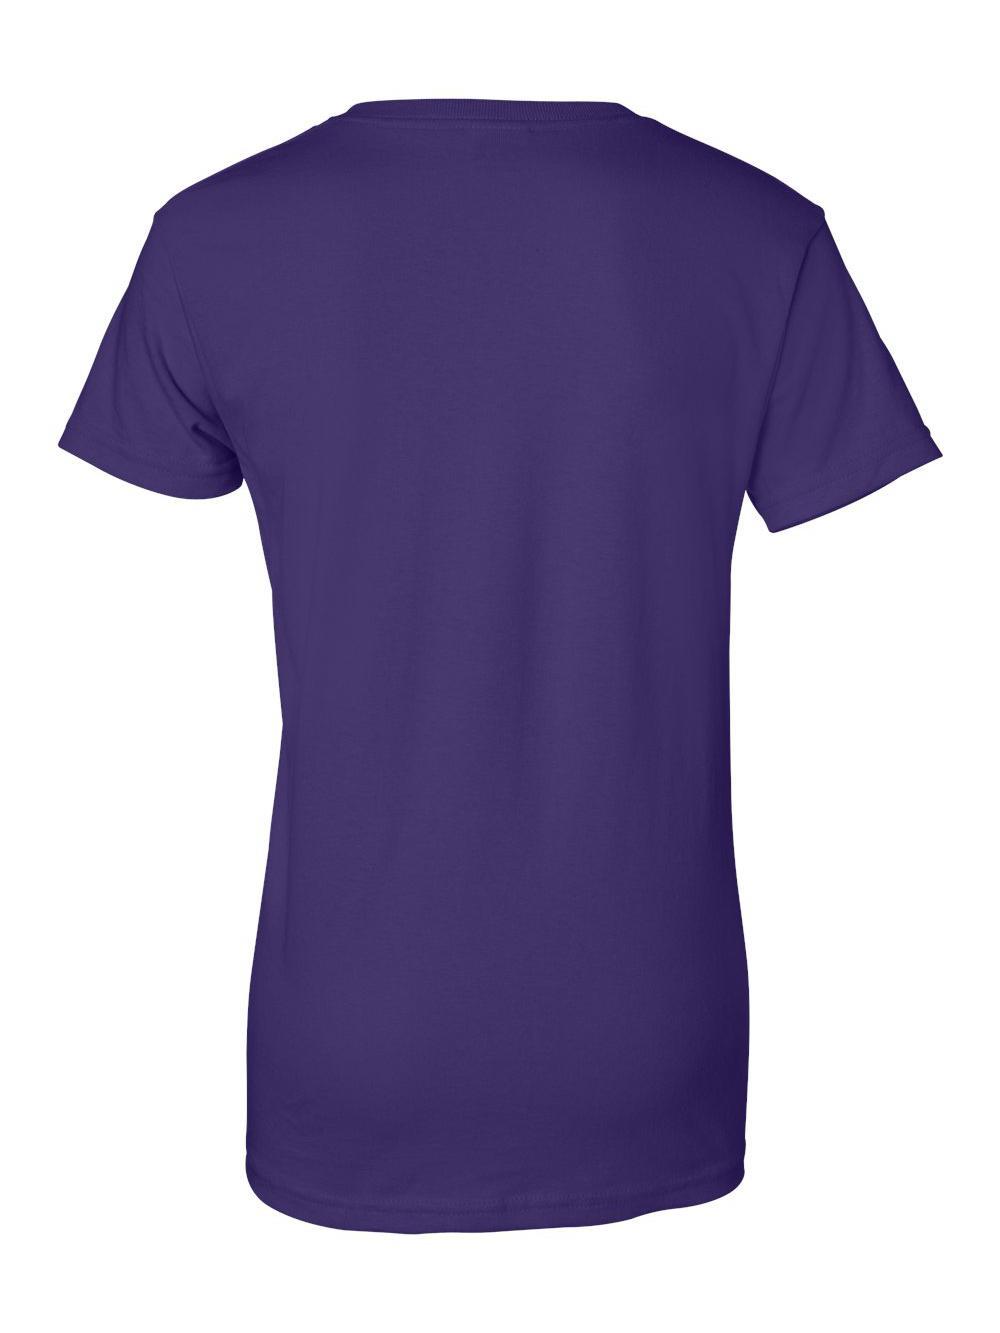 Gildan-Ultra-Cotton-Women-039-s-T-Shirt-2000L thumbnail 52